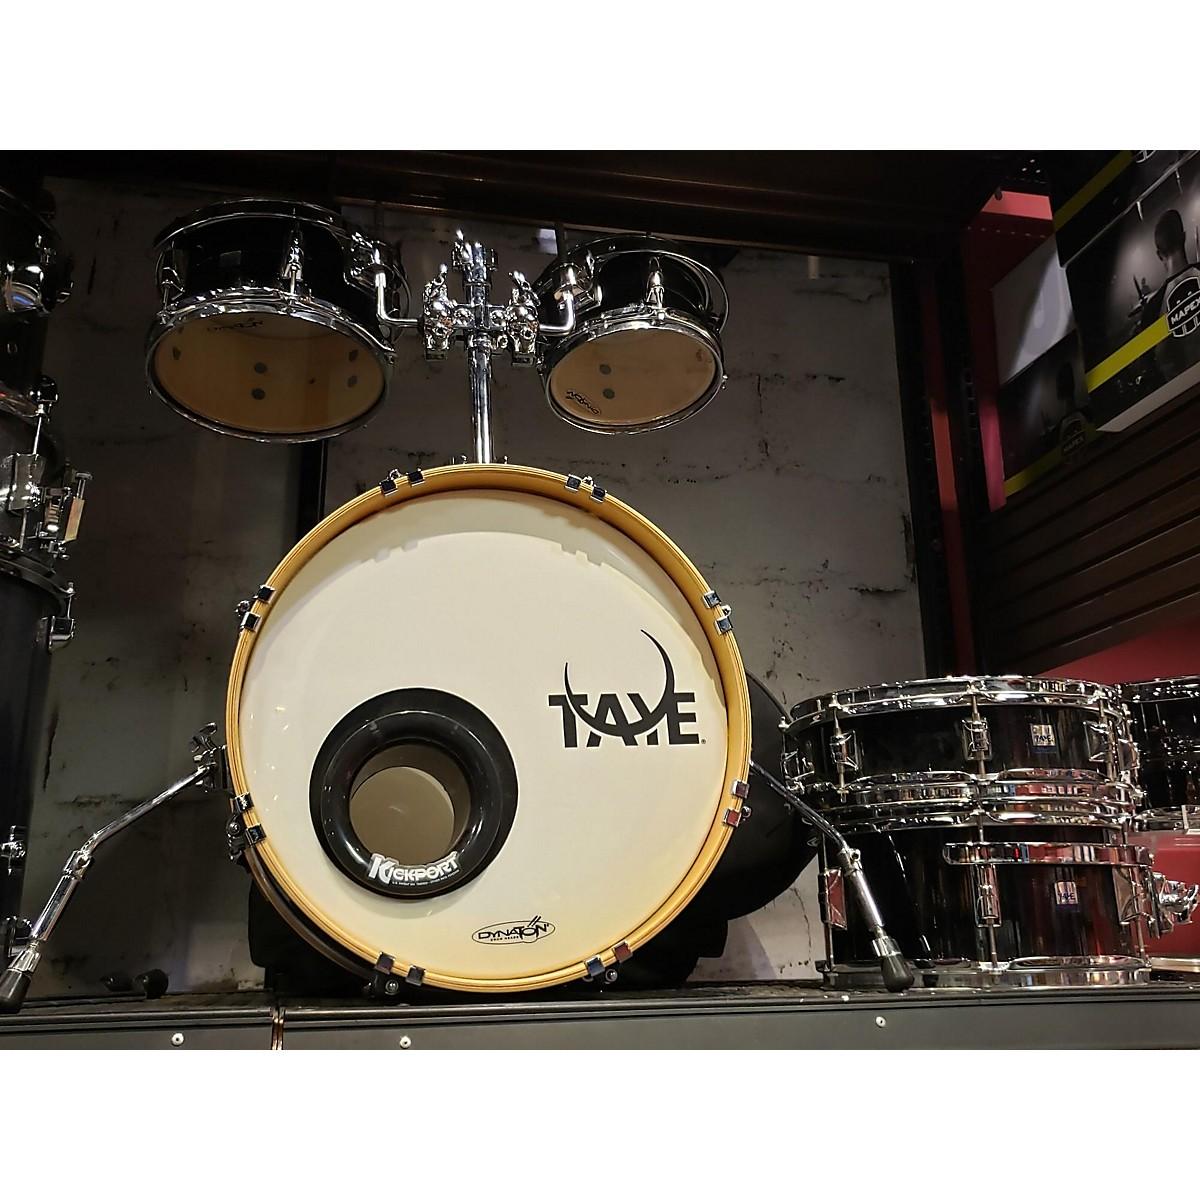 Taye Drums Go Kit Drum Kit